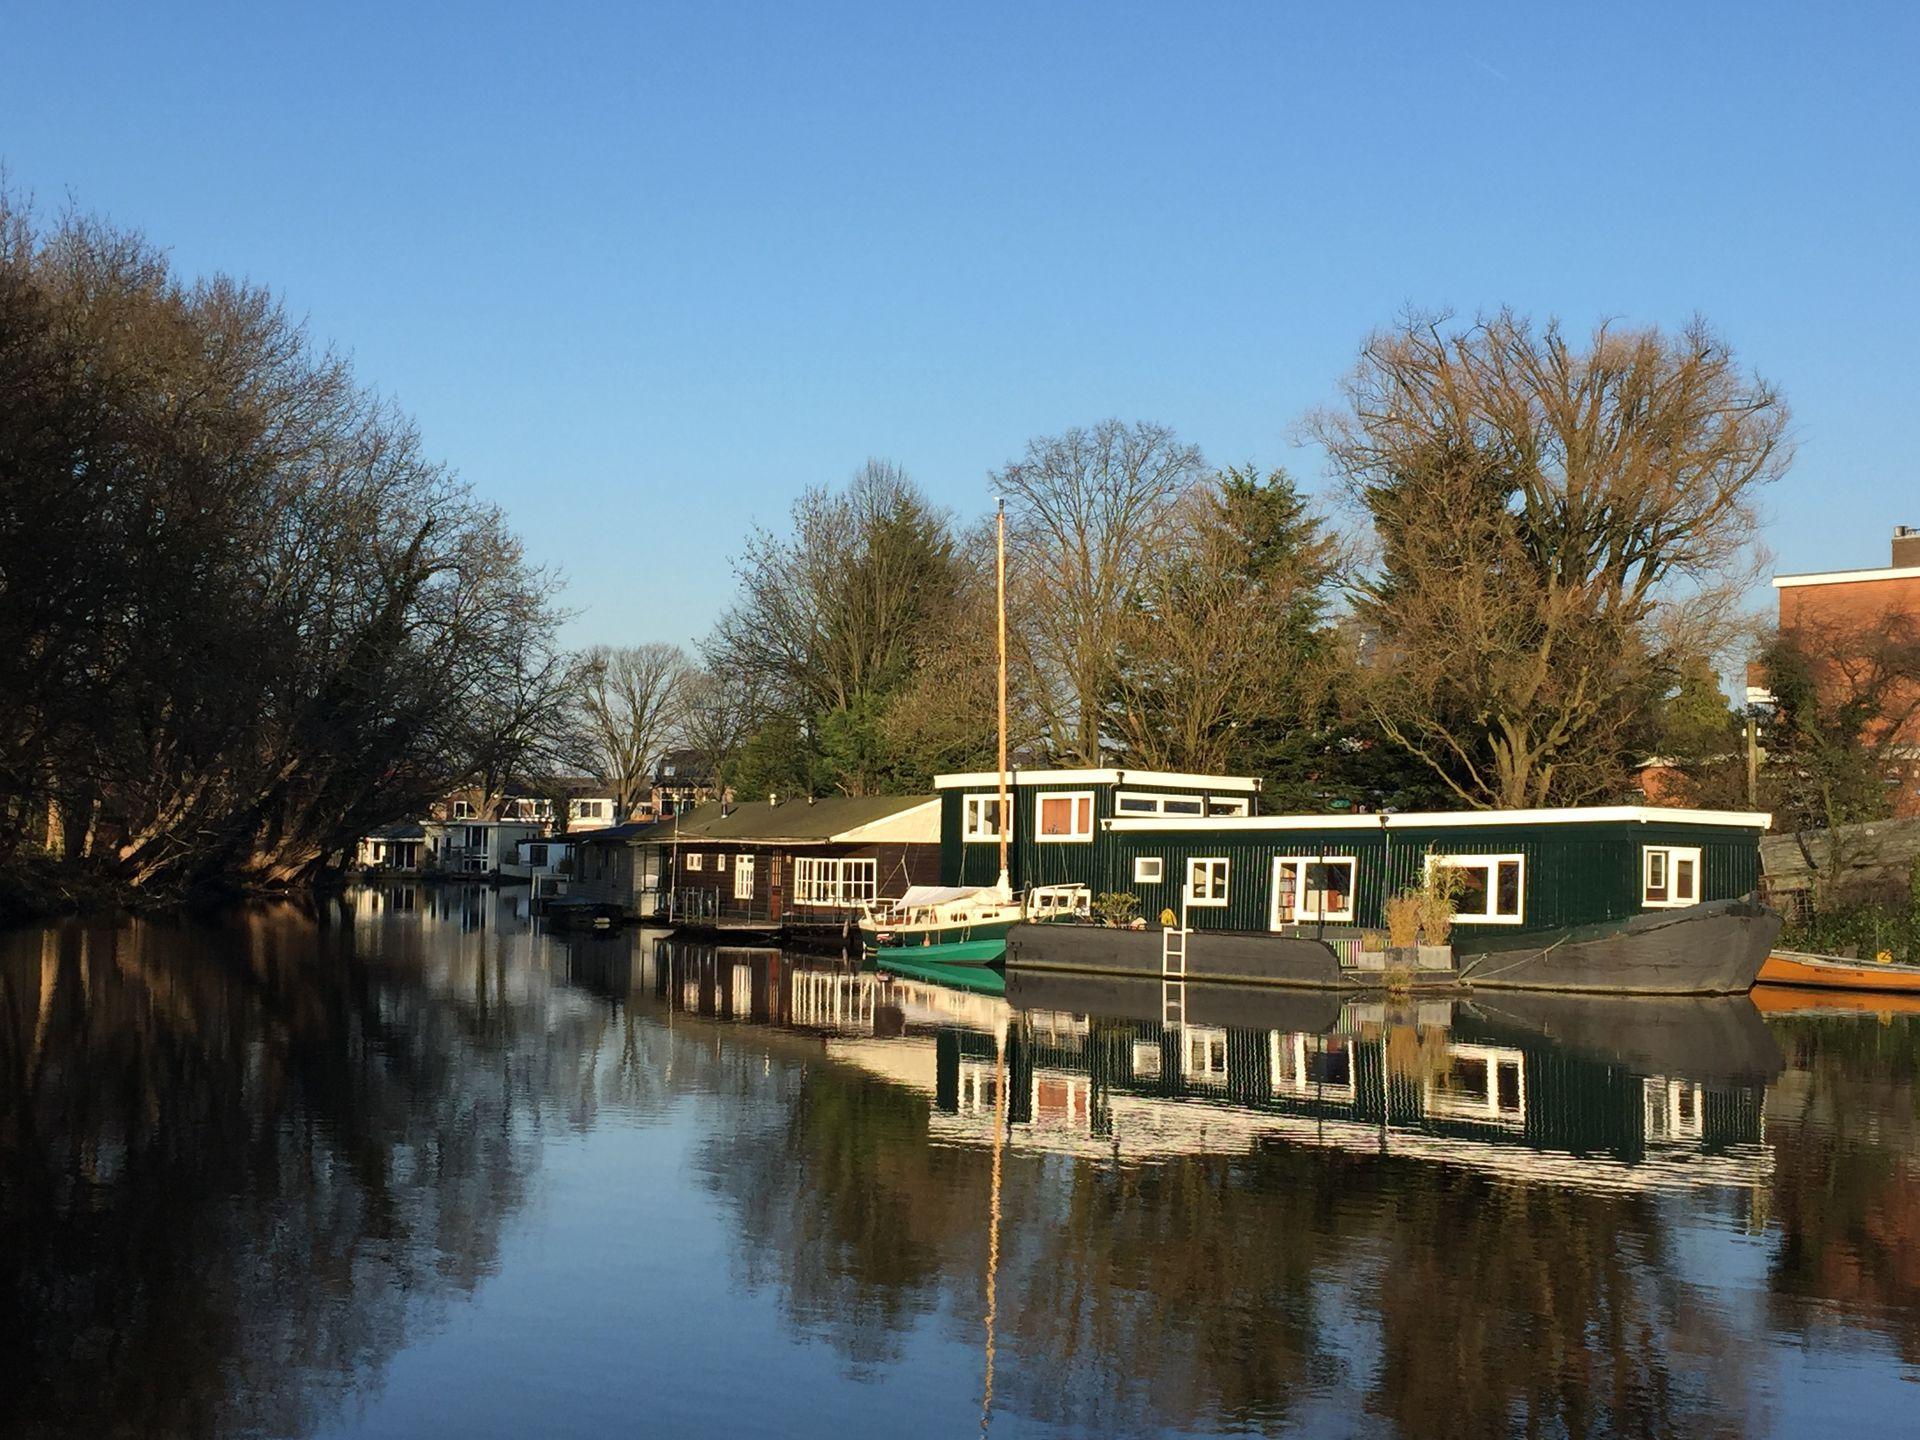 Houseboat Images Amsterdam Leiden Houseboat Home Exchange